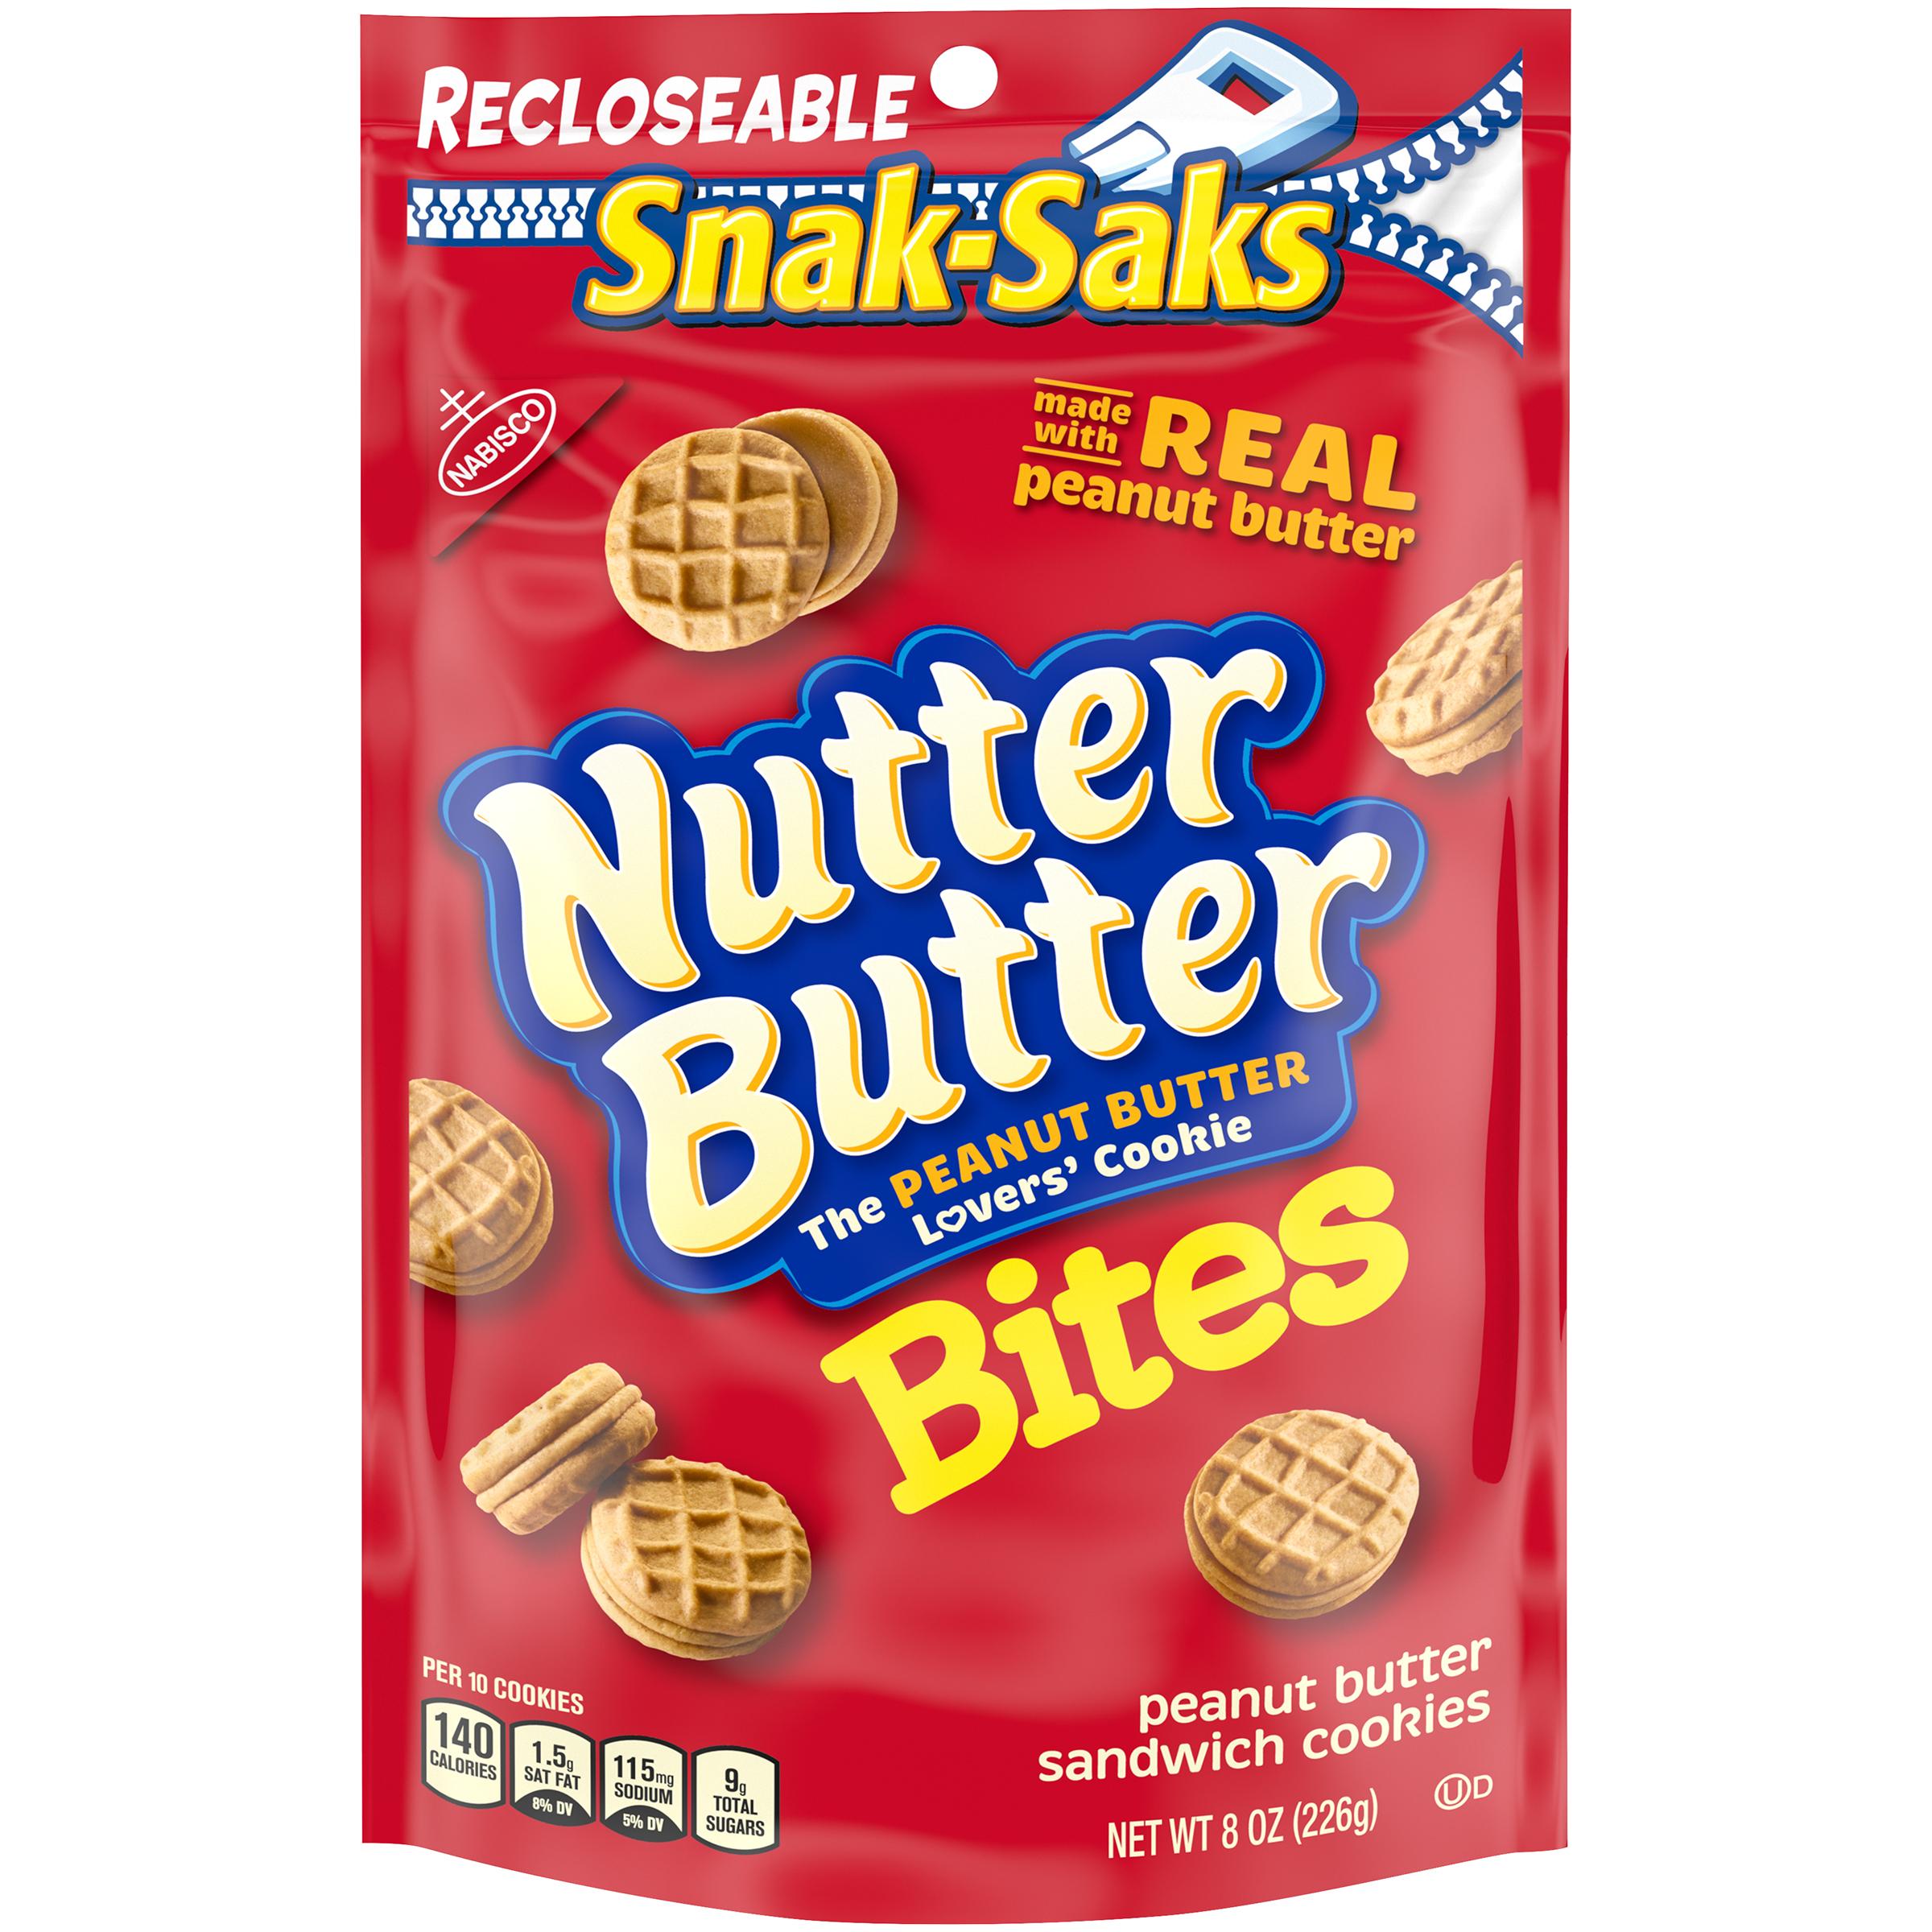 NUTTER BUTTER Bites Lunchbox Cookies Snak Saks 8 oz